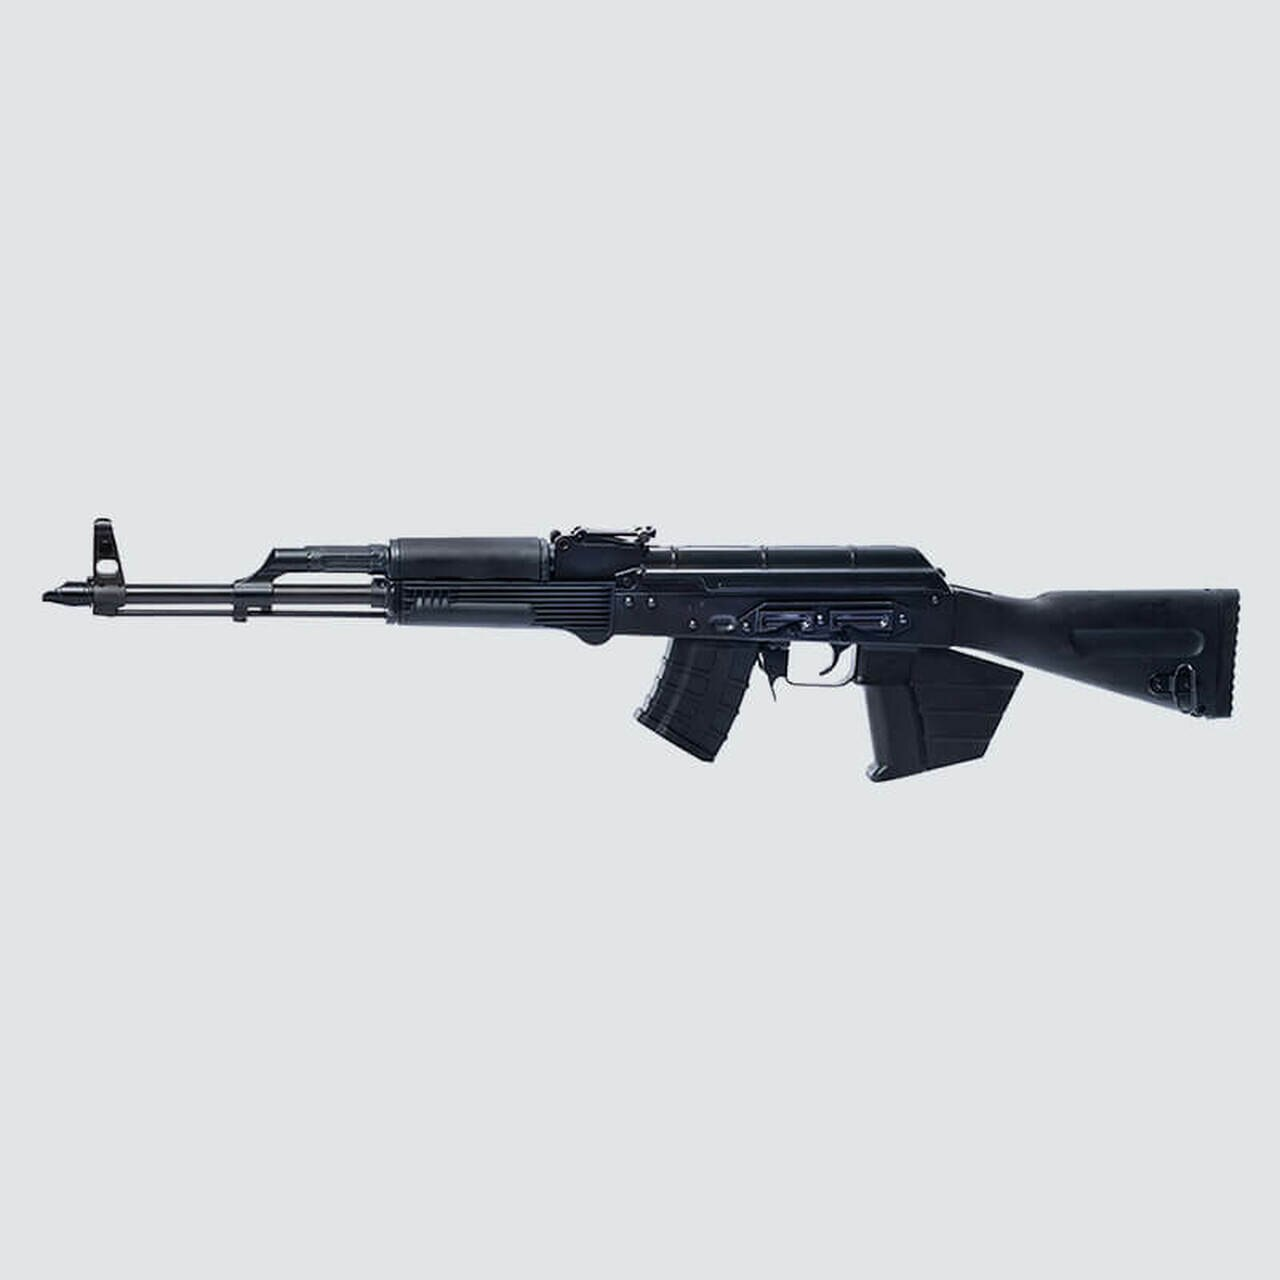 "Image of Riley Defense RAK47 7.62X39, 16"" Barrel, Black, Polymer Stock, CA Compliant, 10 Rd Mag"